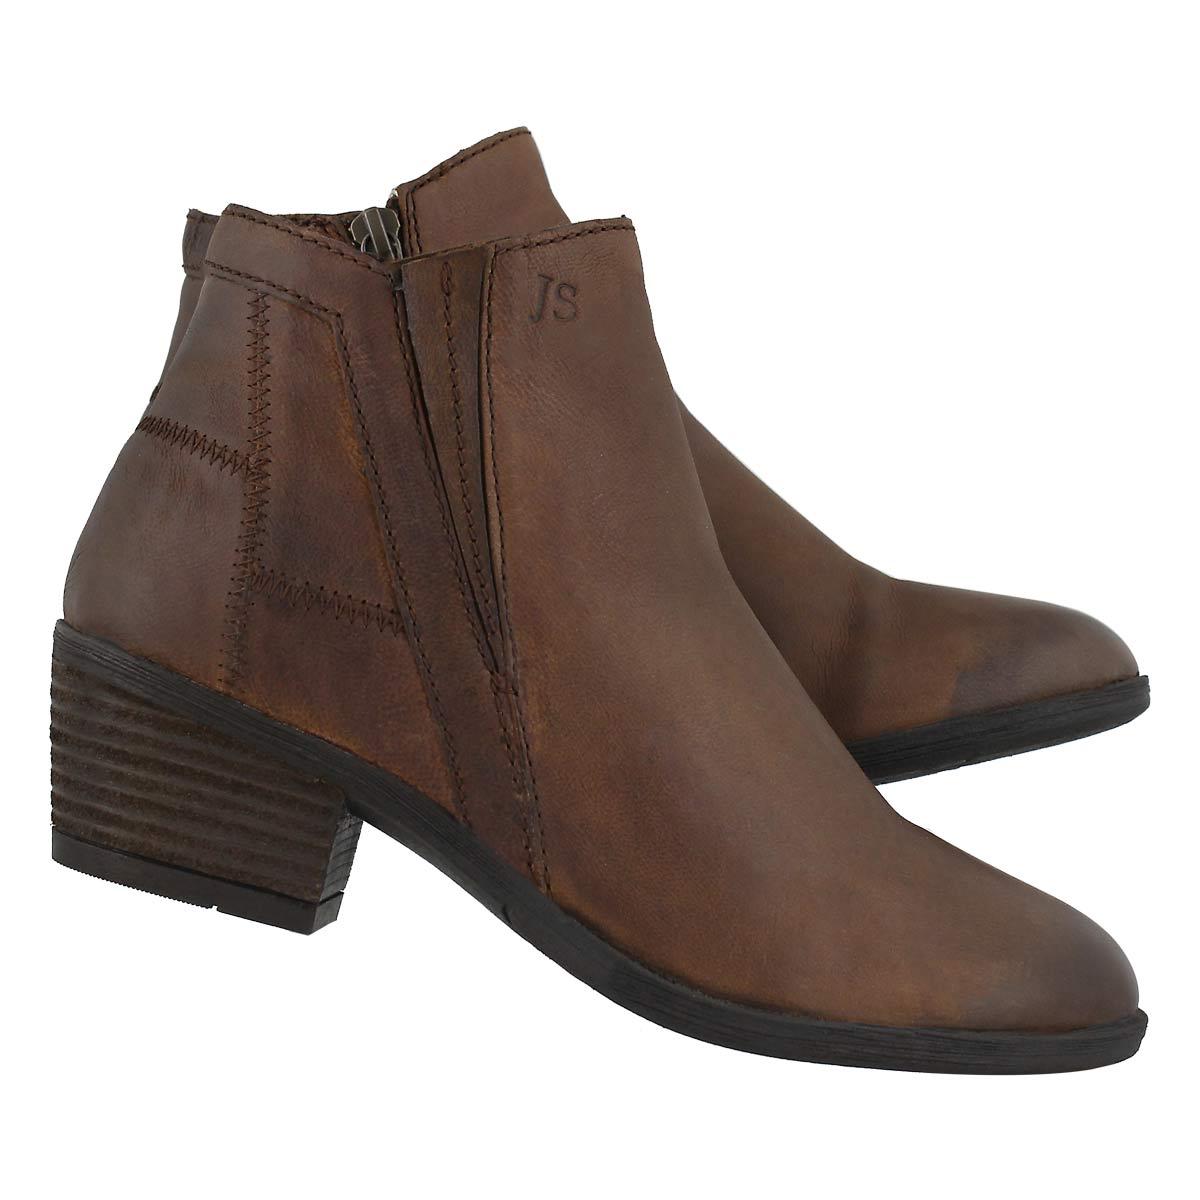 Lds Daphne 09 moro slip on boot